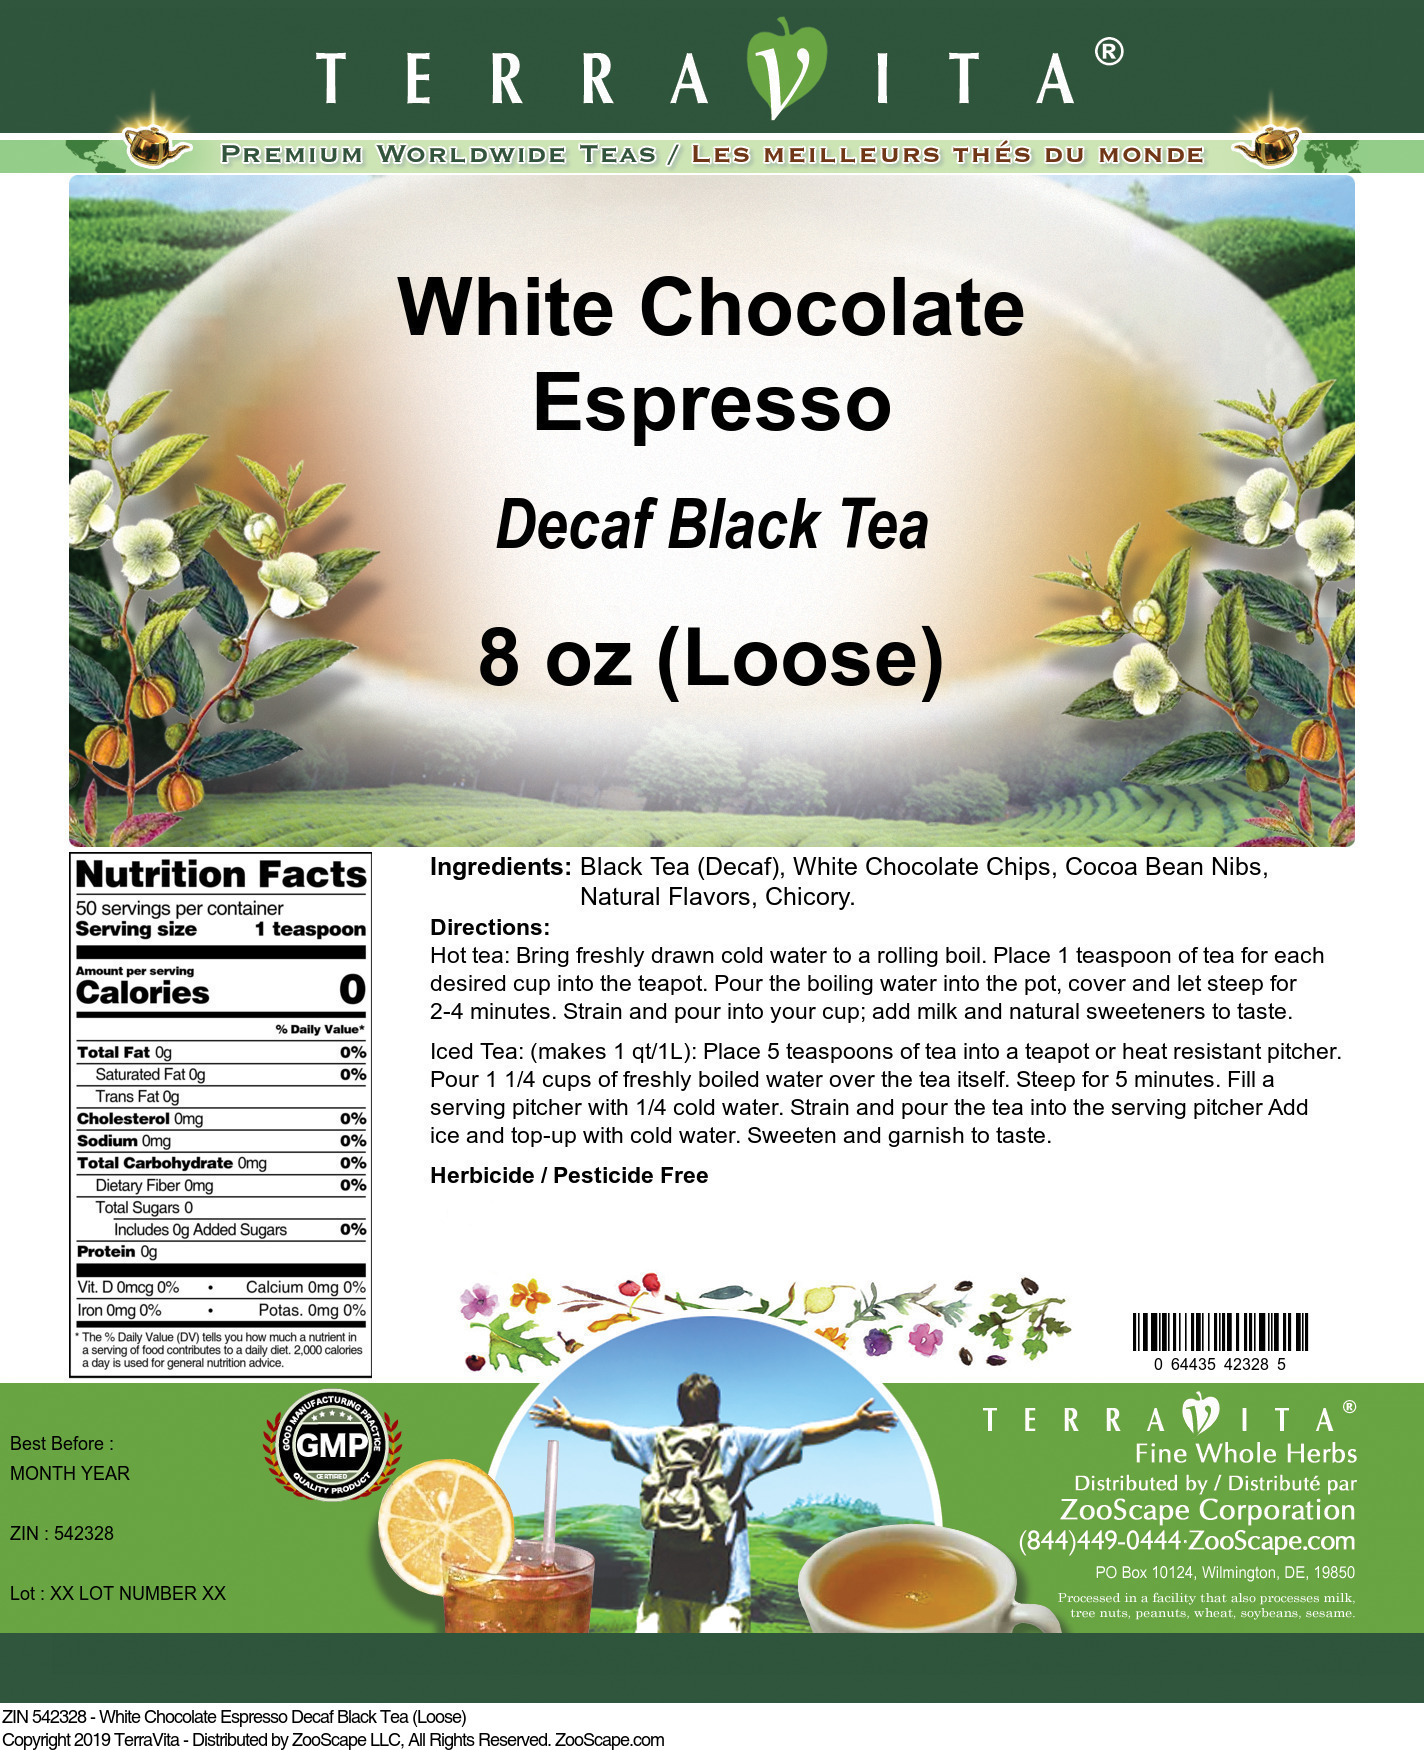 White Chocolate Espresso Decaf Black Tea (Loose)